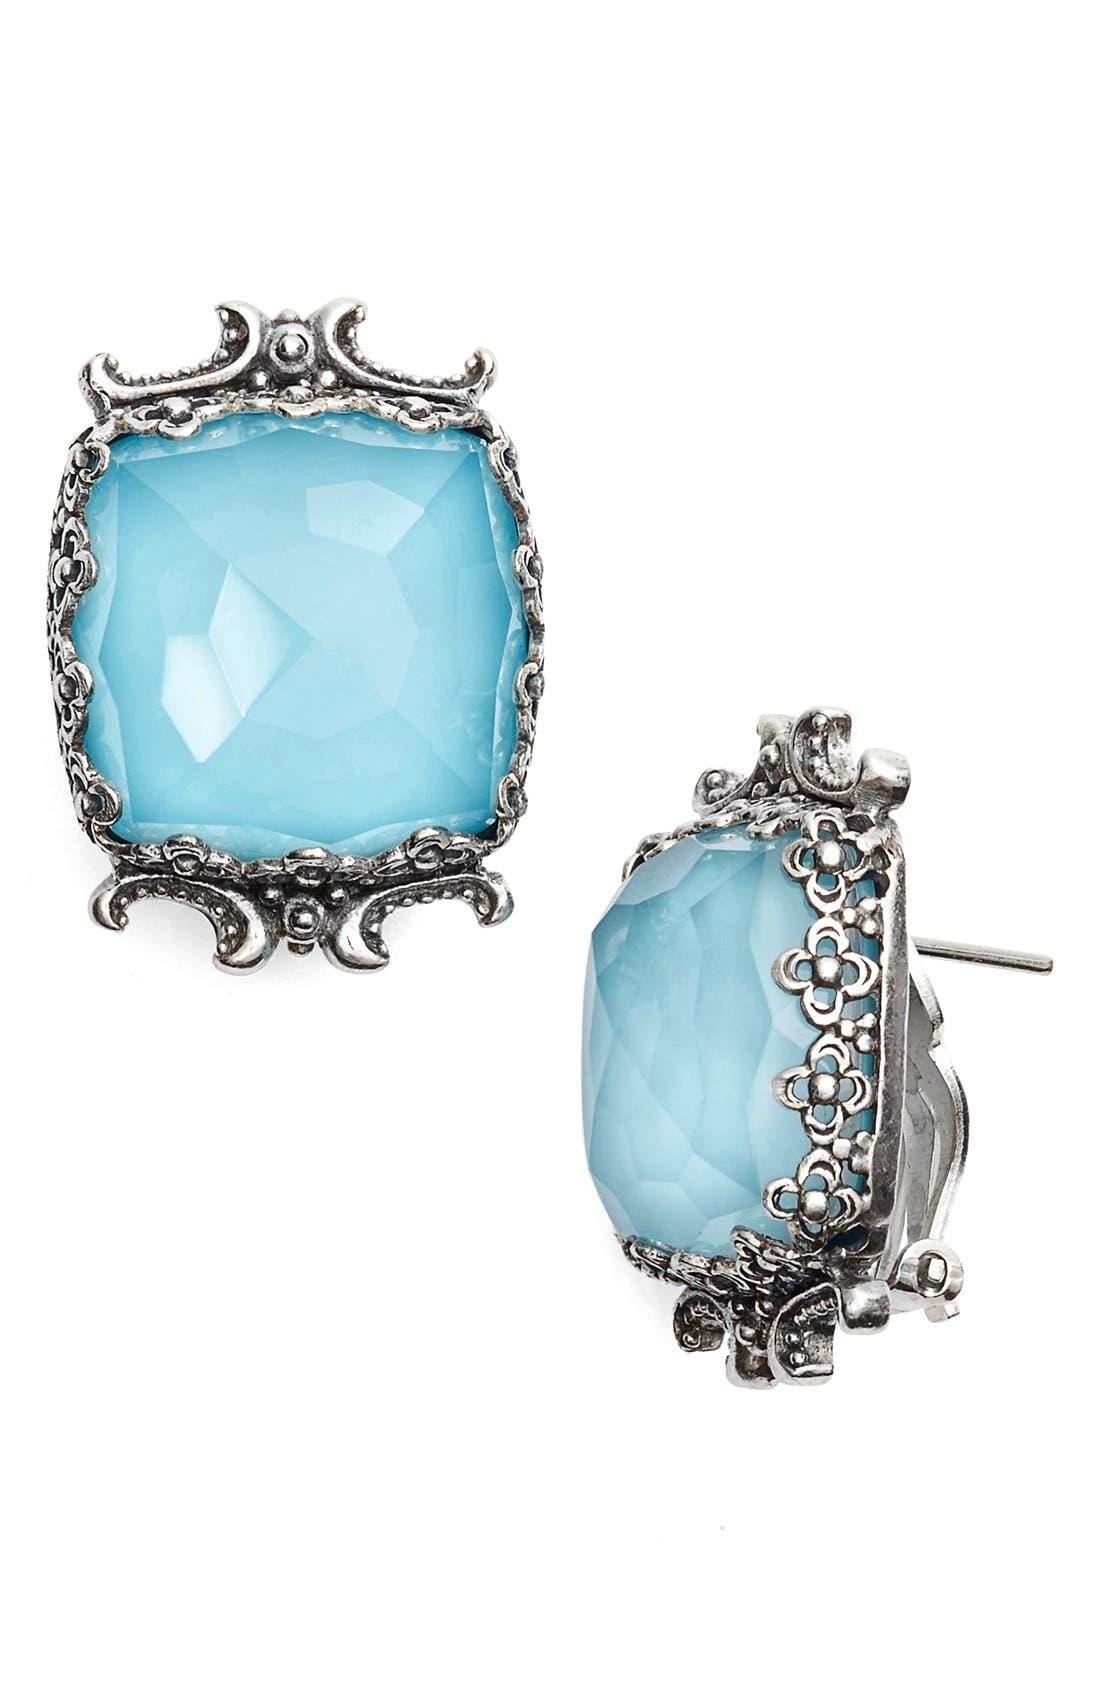 'Aegean' Clip Earrings,                         Main,                         color, Silver/ Blue Rock Crystal